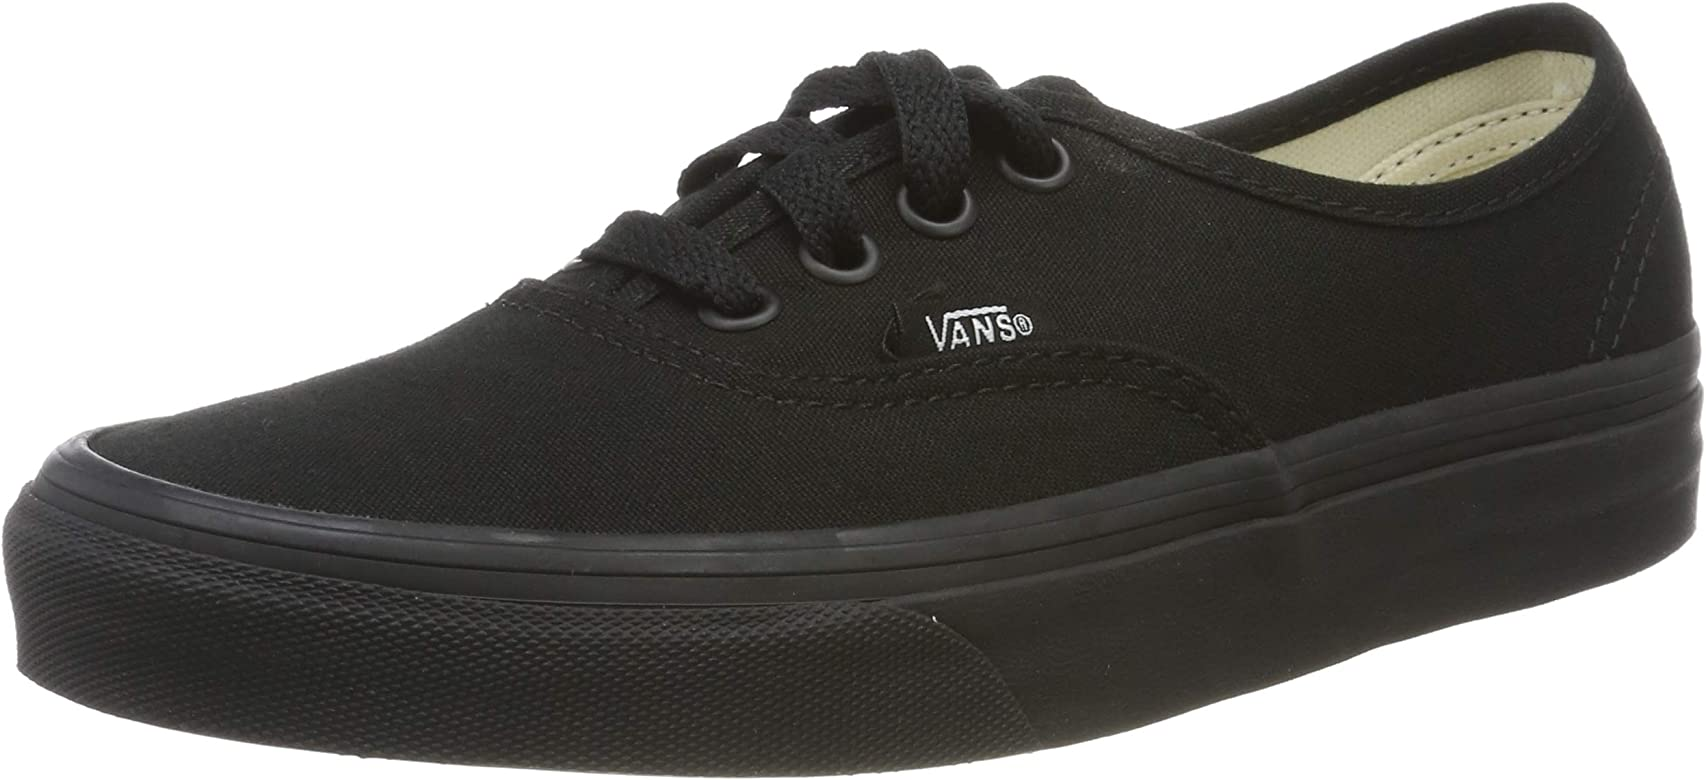 950b657083 Vans Unisex Authentic Black Black Sneaker - 7.5